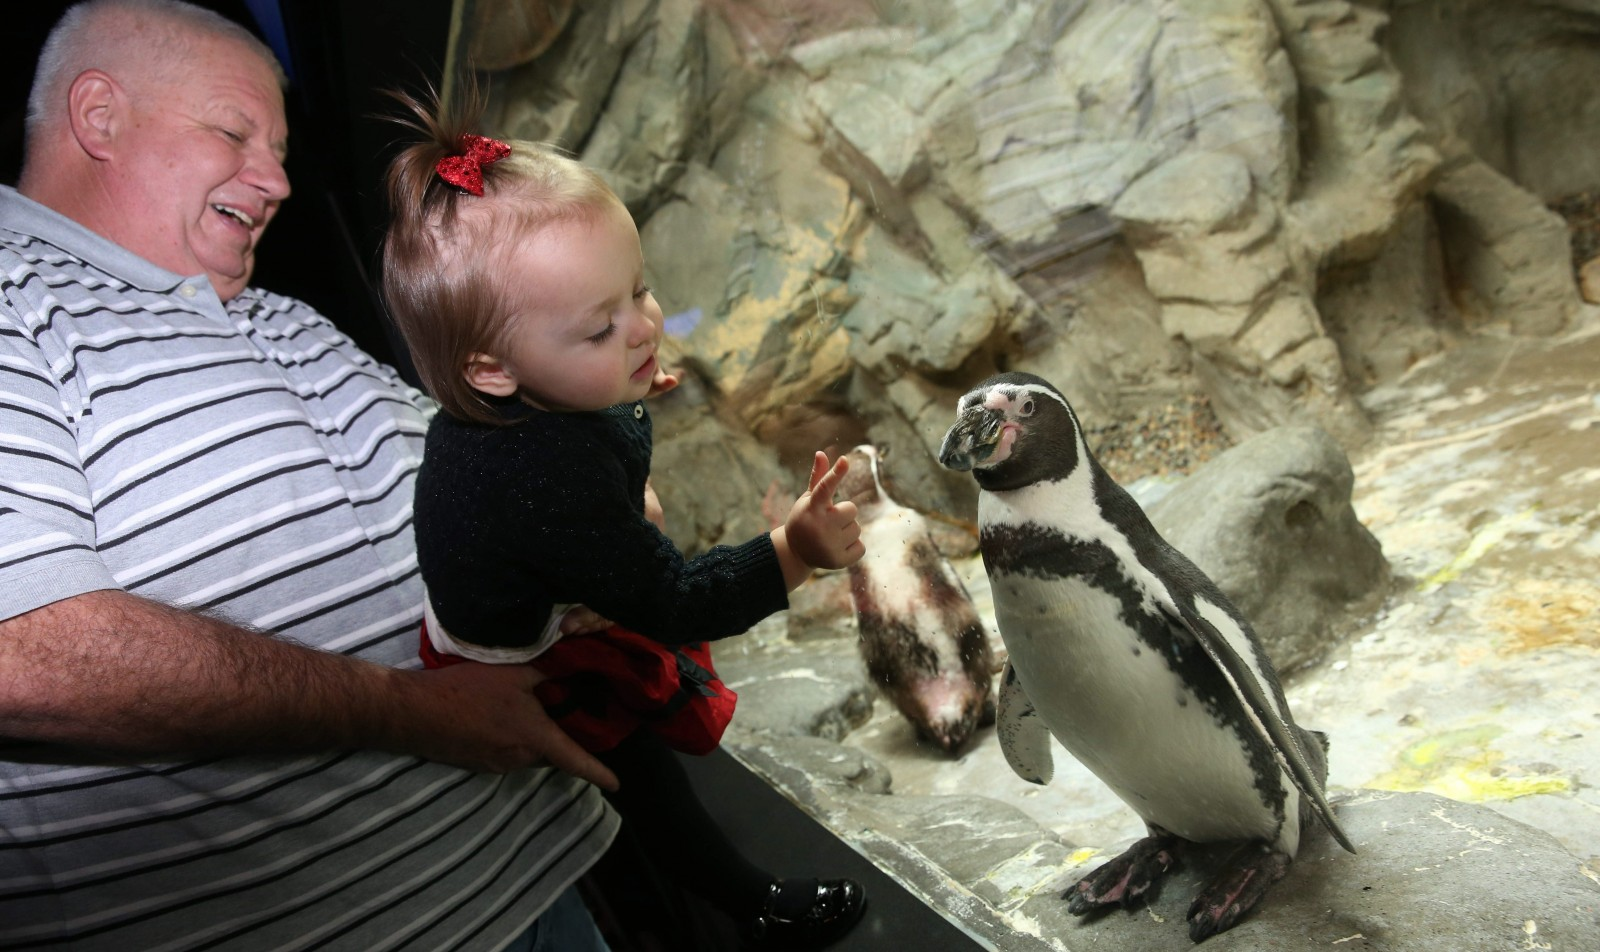 John Vaughan of Buffalo helps his granddaughter, Bella Vaughan of Philadelphia, get a close-up view of the penguins at the Aquarium of Niagara.  (Sharon Cantillon/Buffalo News)